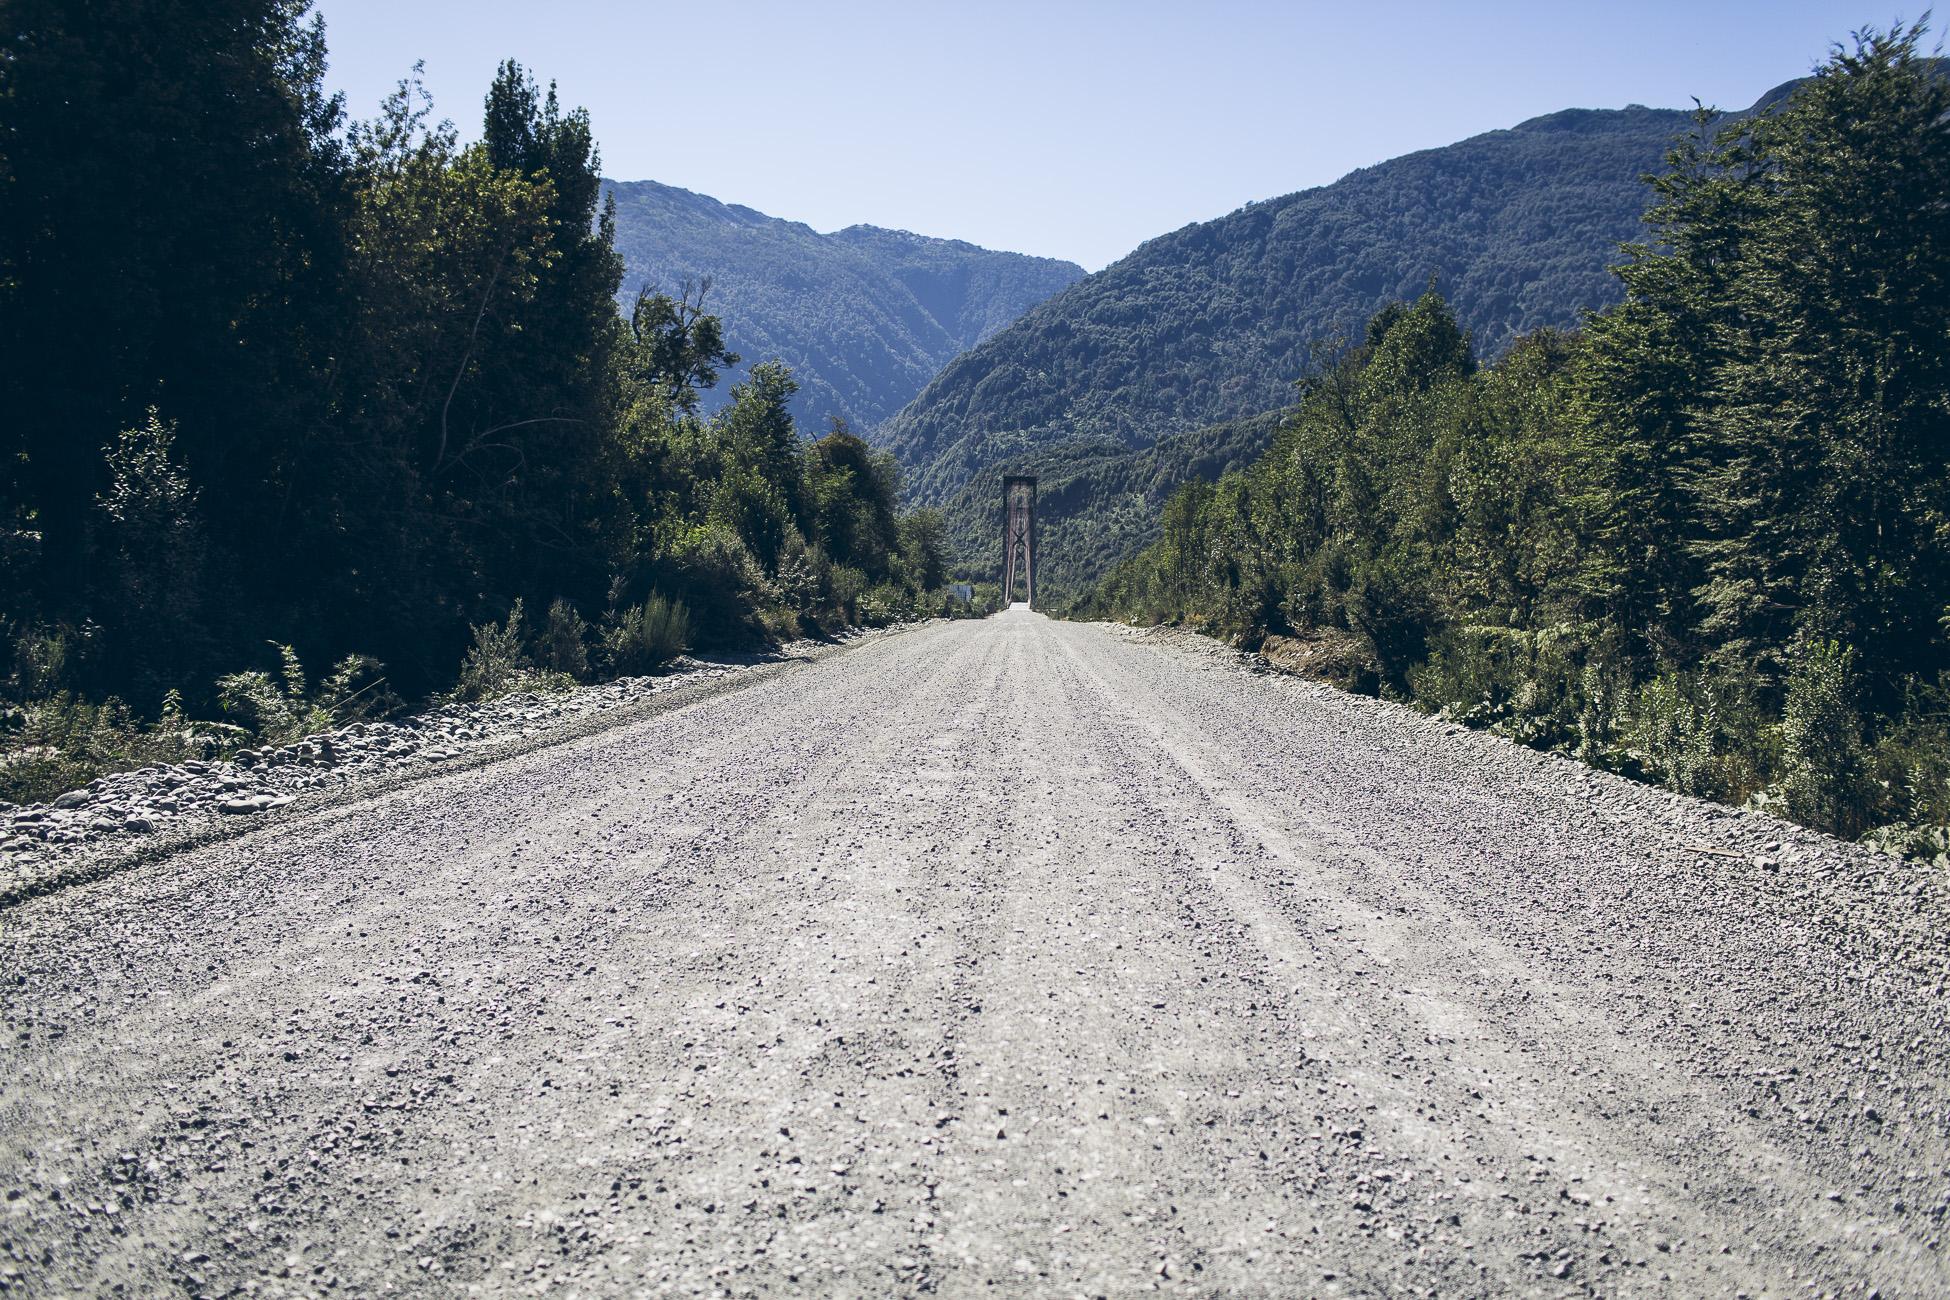 desktoglory_carretera_austral-36